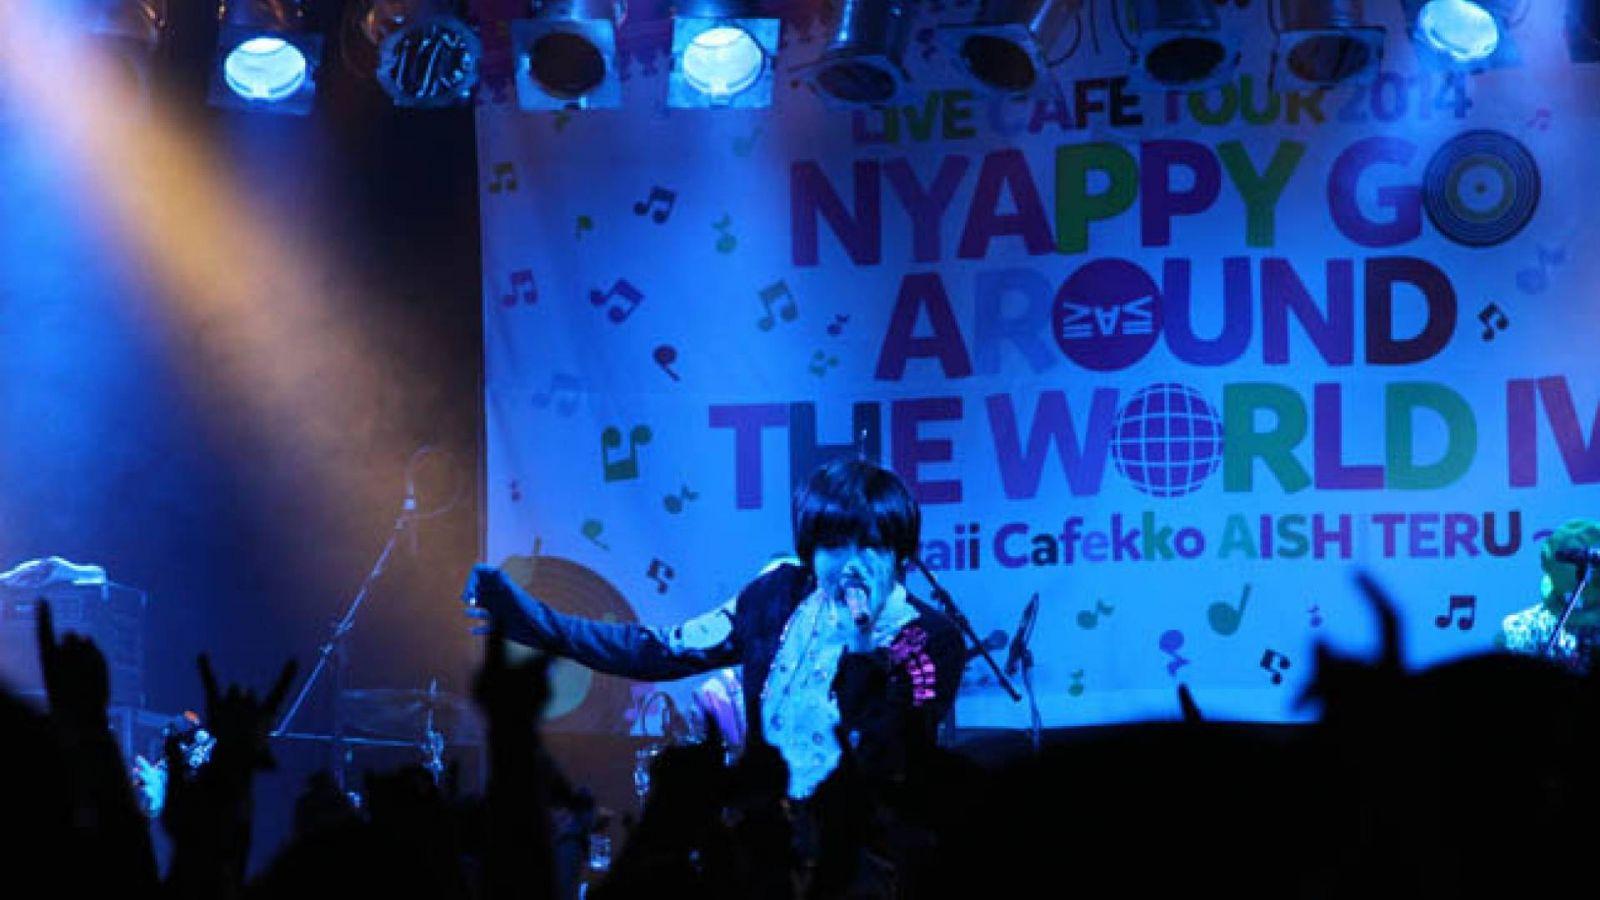 An Cafe LIVE CAFE TOUR 2014 NYAPPY GO AROUND THE WORLD IV ~kawaii Cafekko AISHITERU~ in München © An Cafe - JaME - Birgit